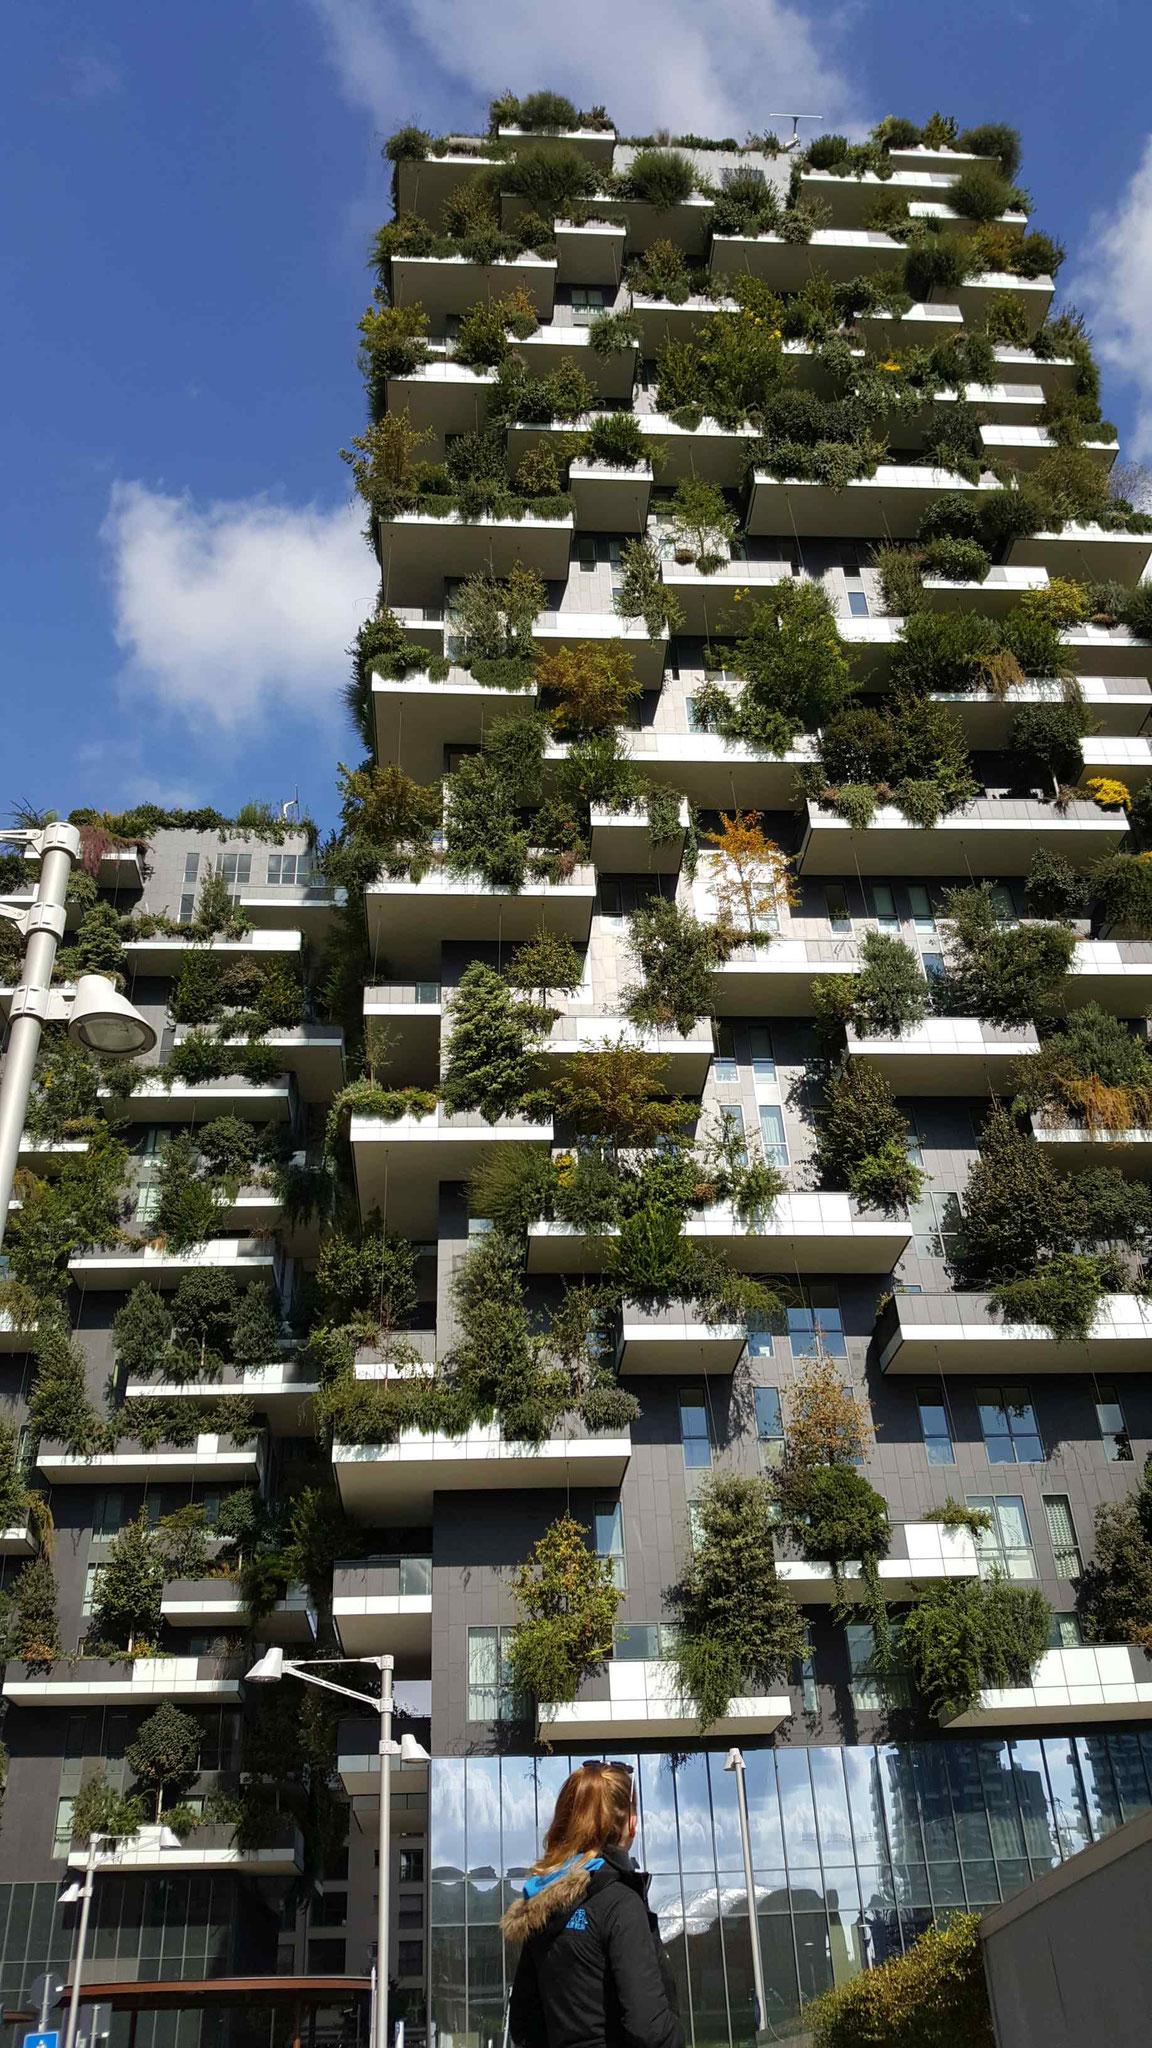 Vorblid Mailand: Bosco Vertikale